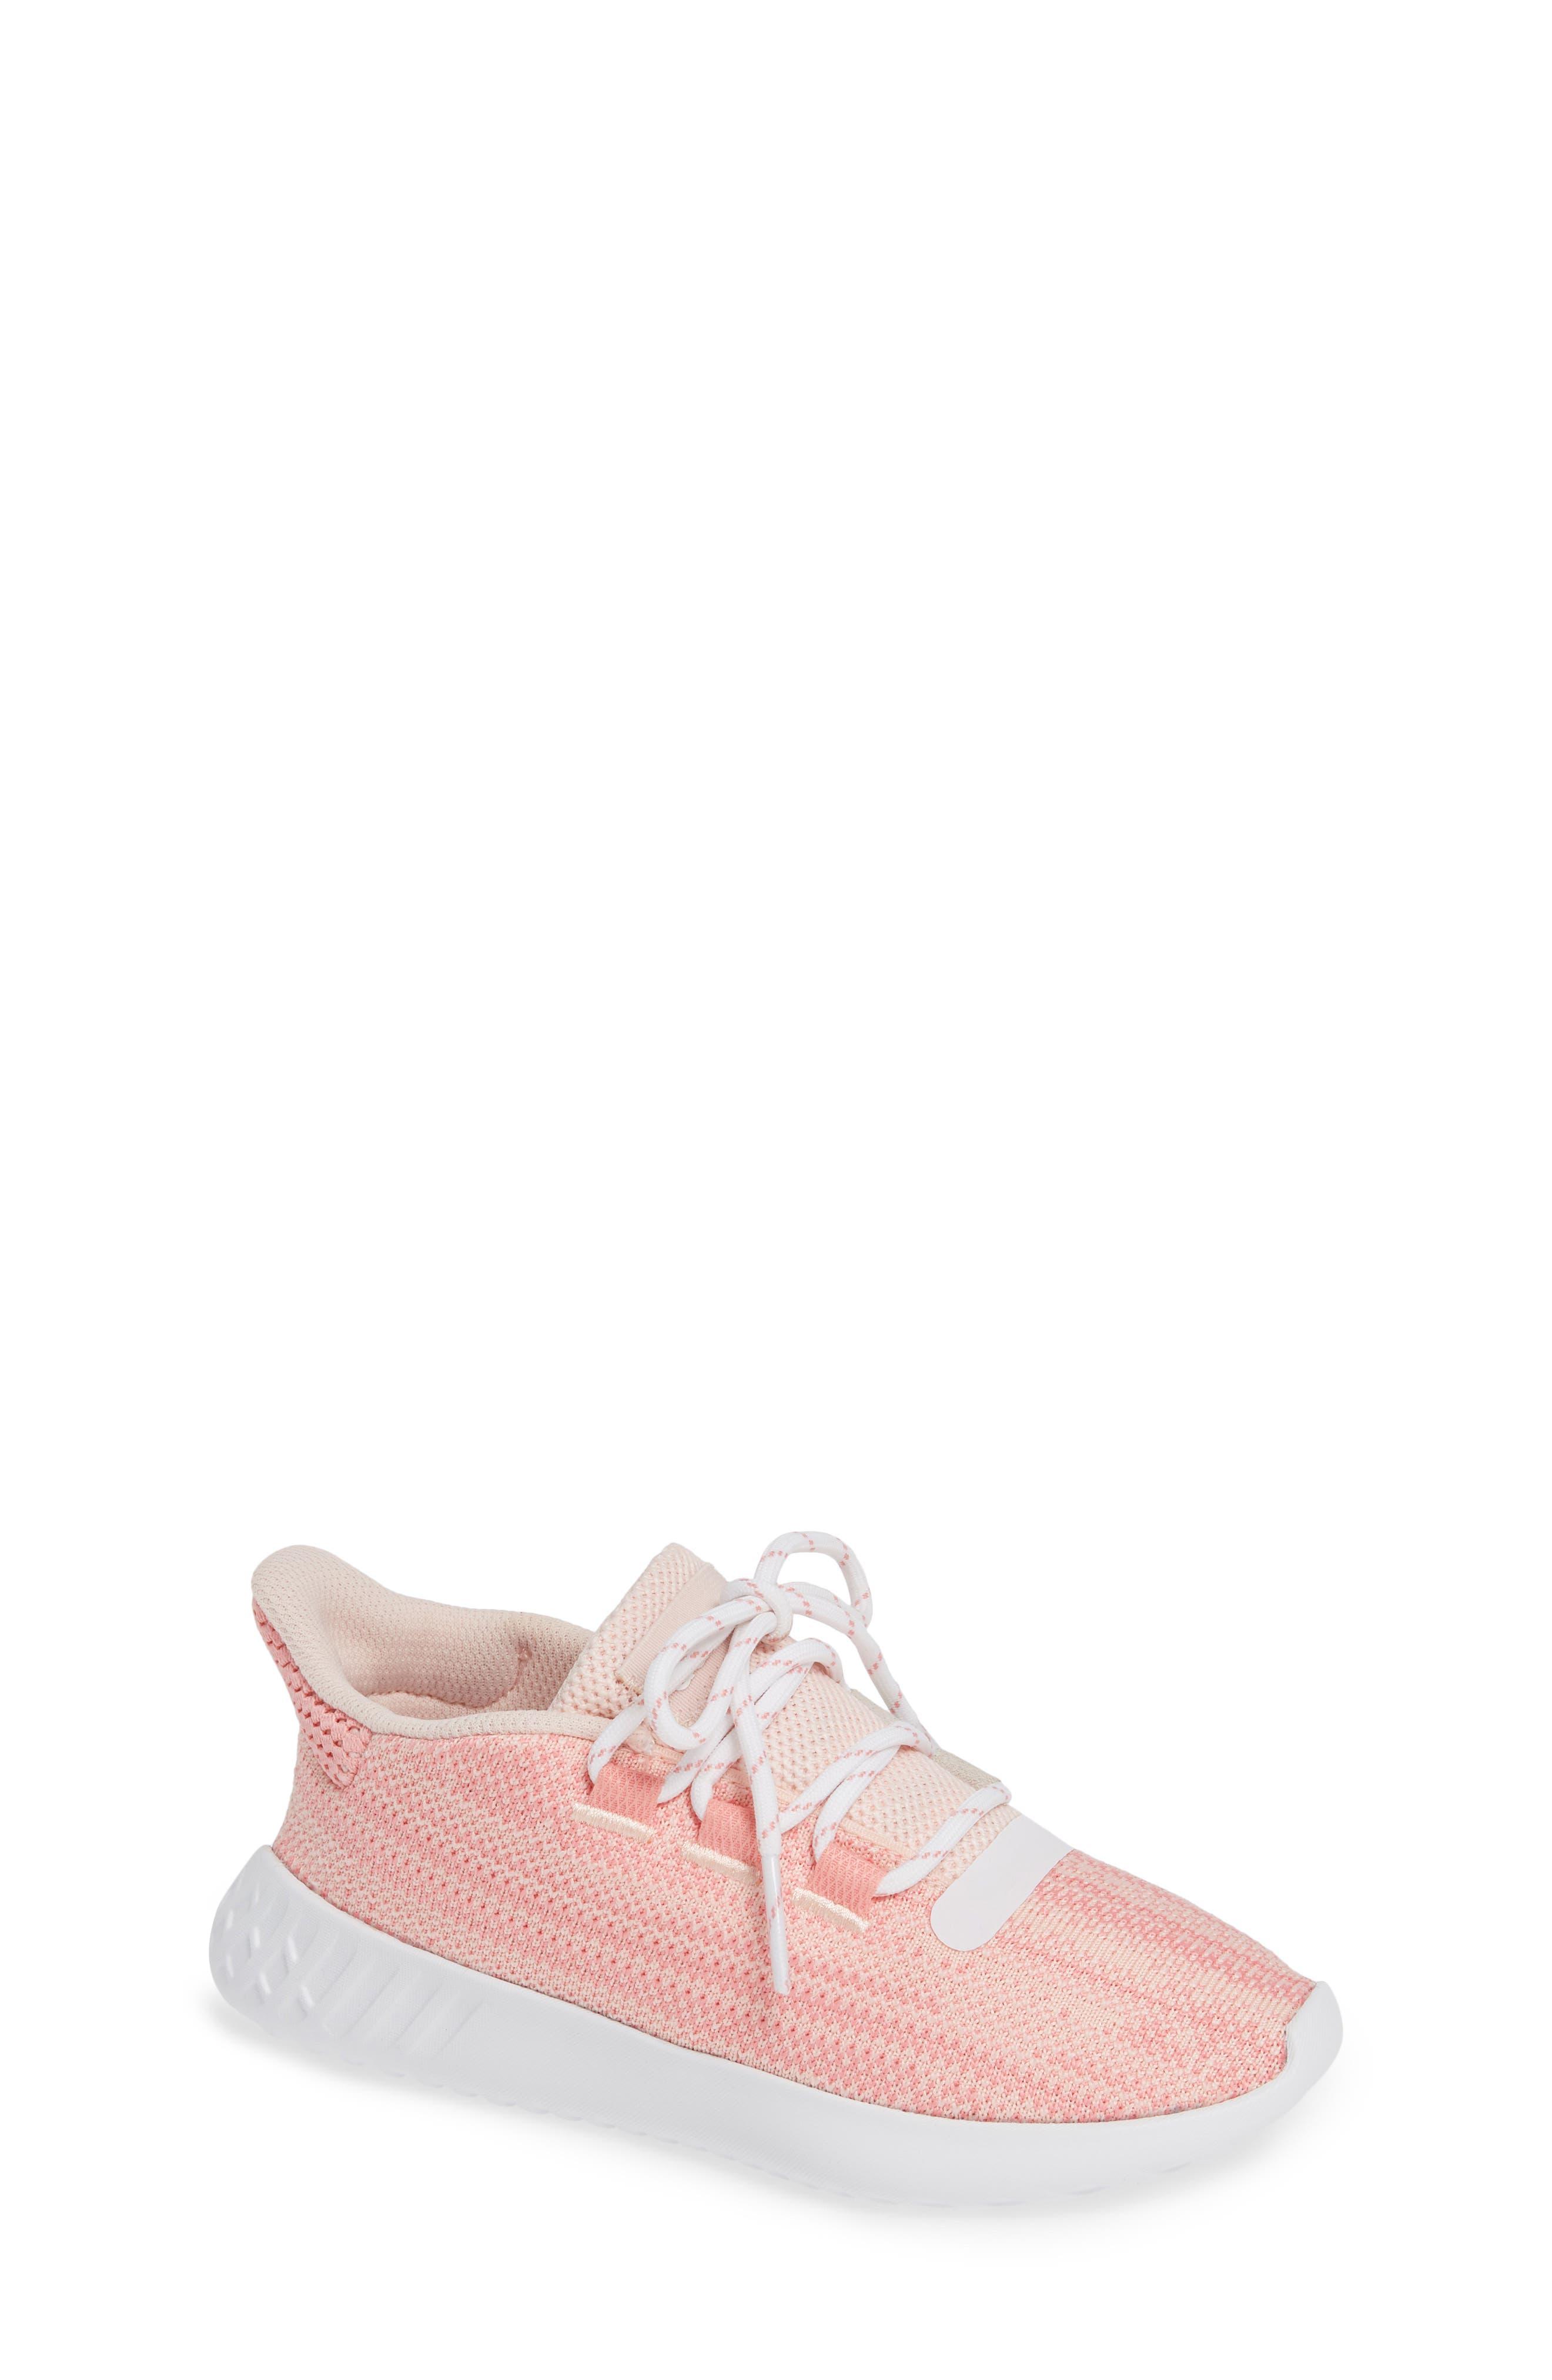 Infant Boys Adidas Tubular Dusk Primeknit Sneaker Size 4 M  Pink